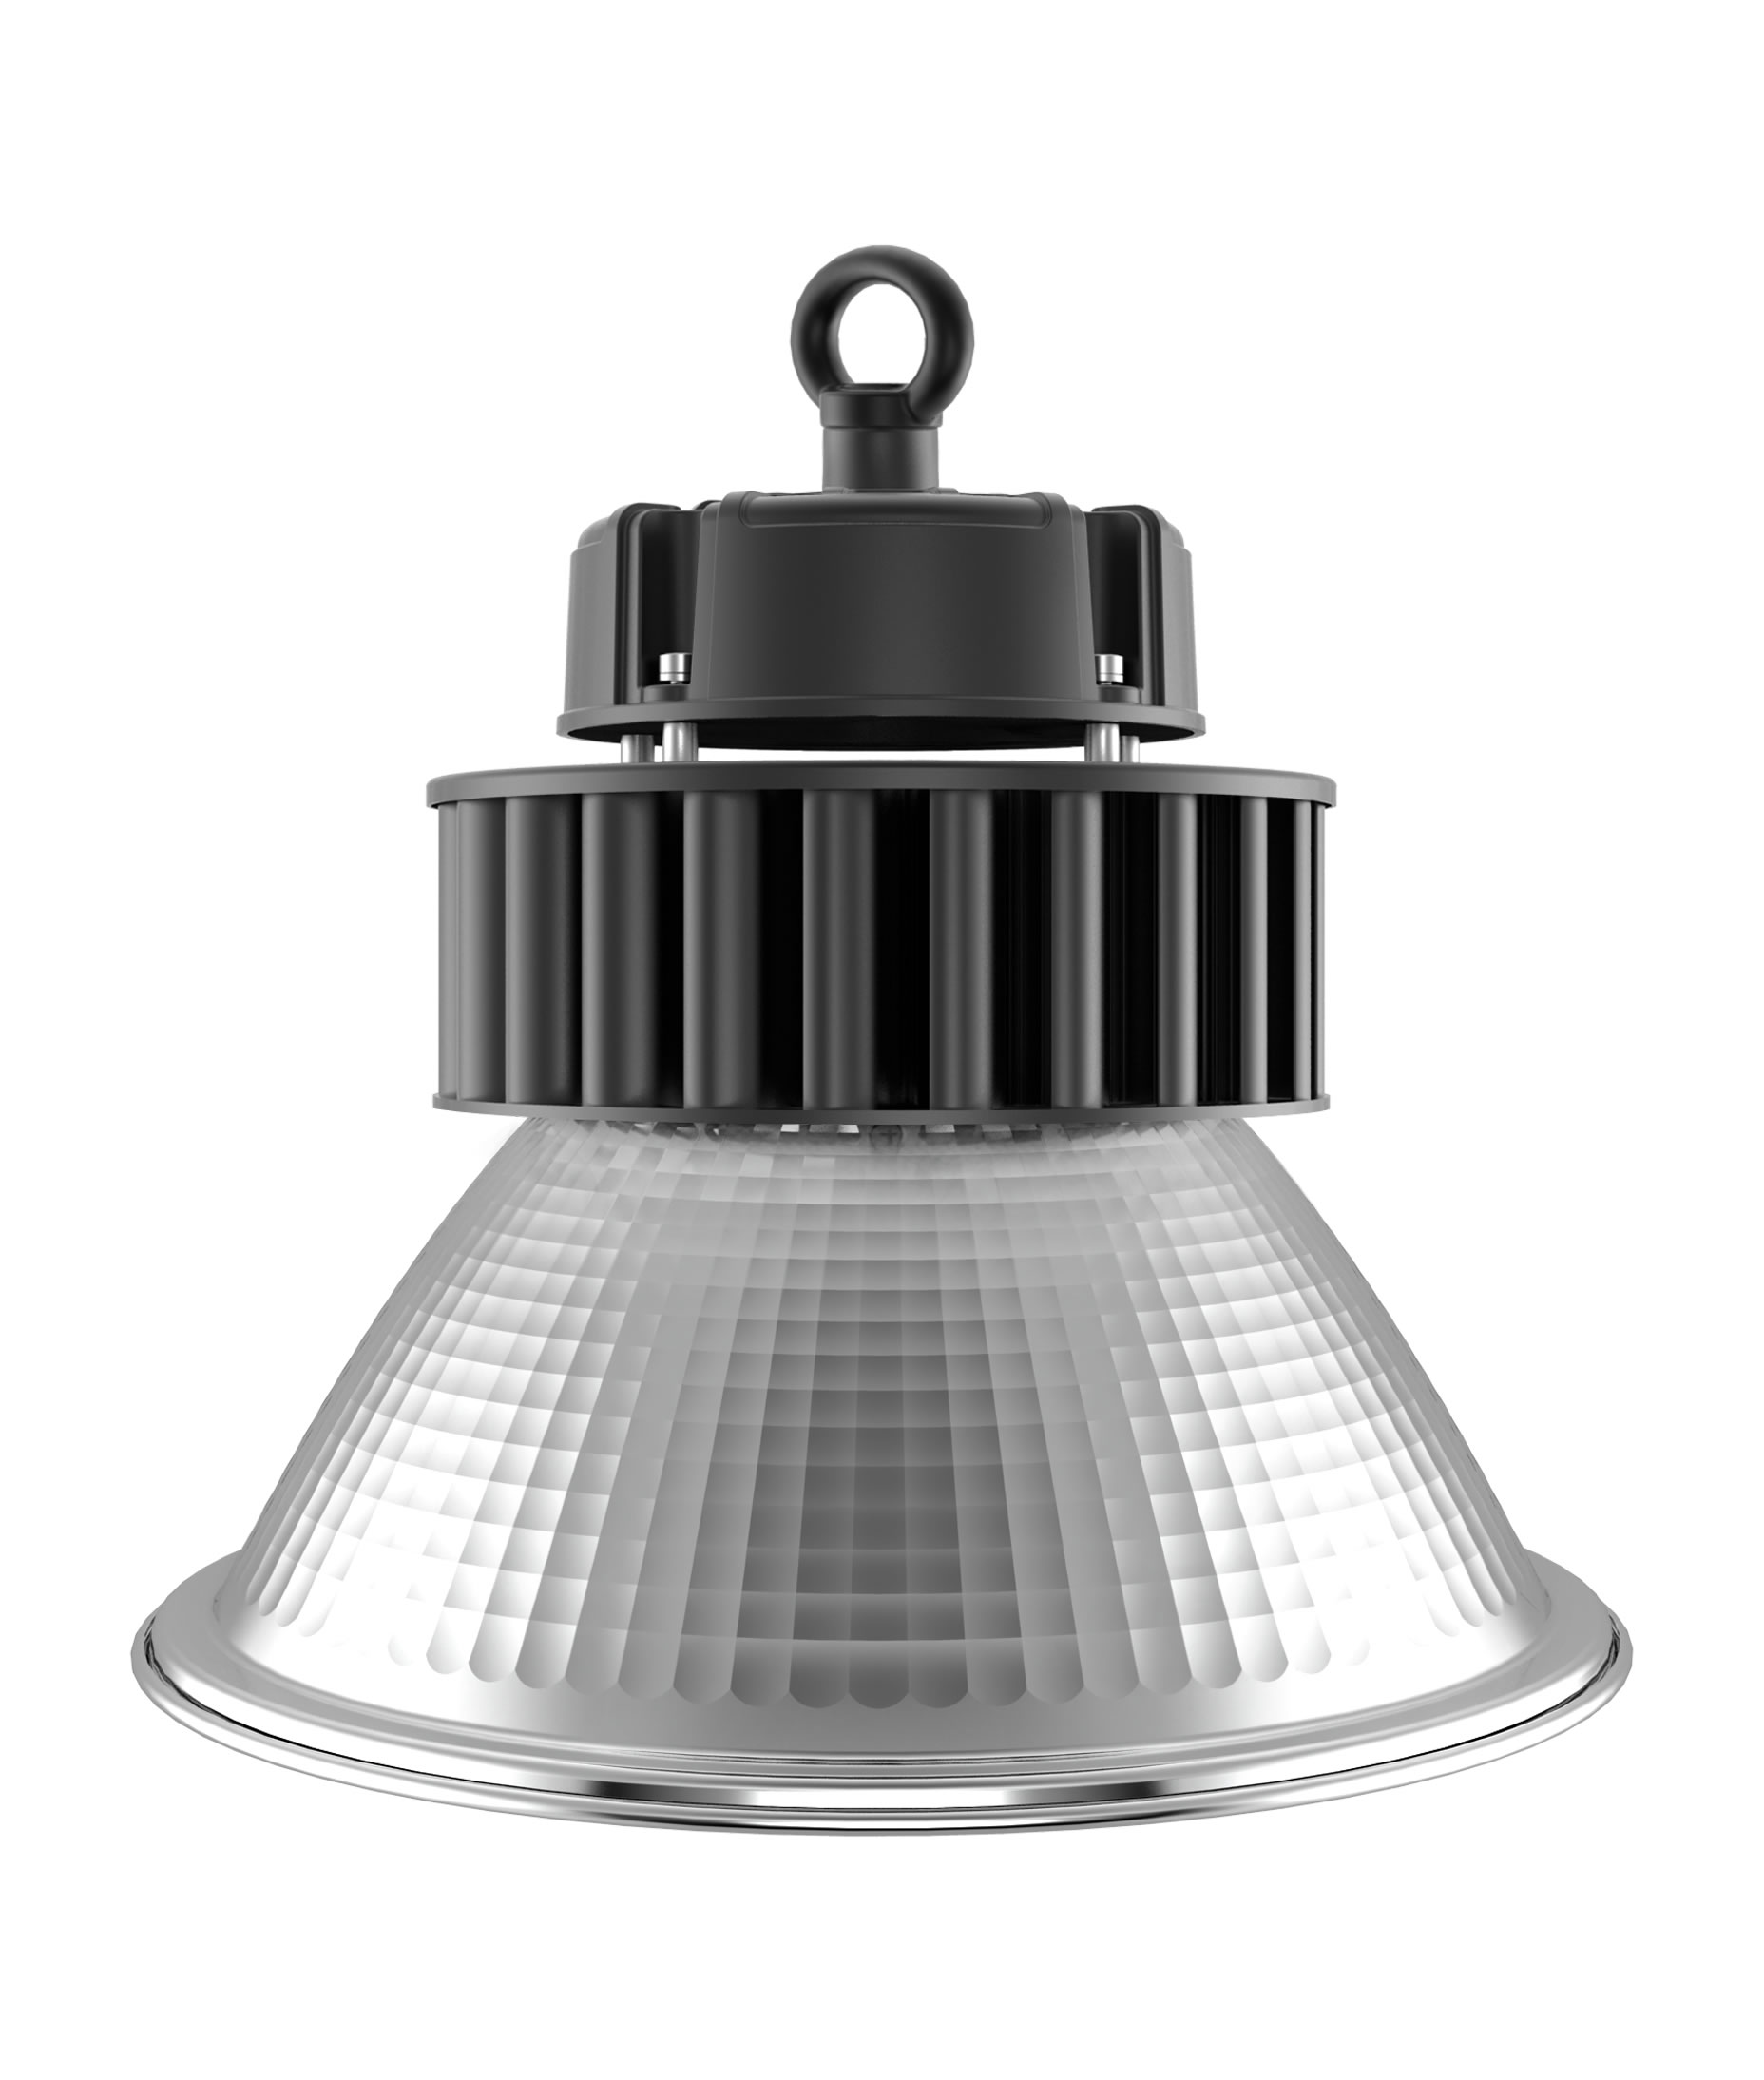 60w 100w 150w 200w led high bay light factory light. Black Bedroom Furniture Sets. Home Design Ideas